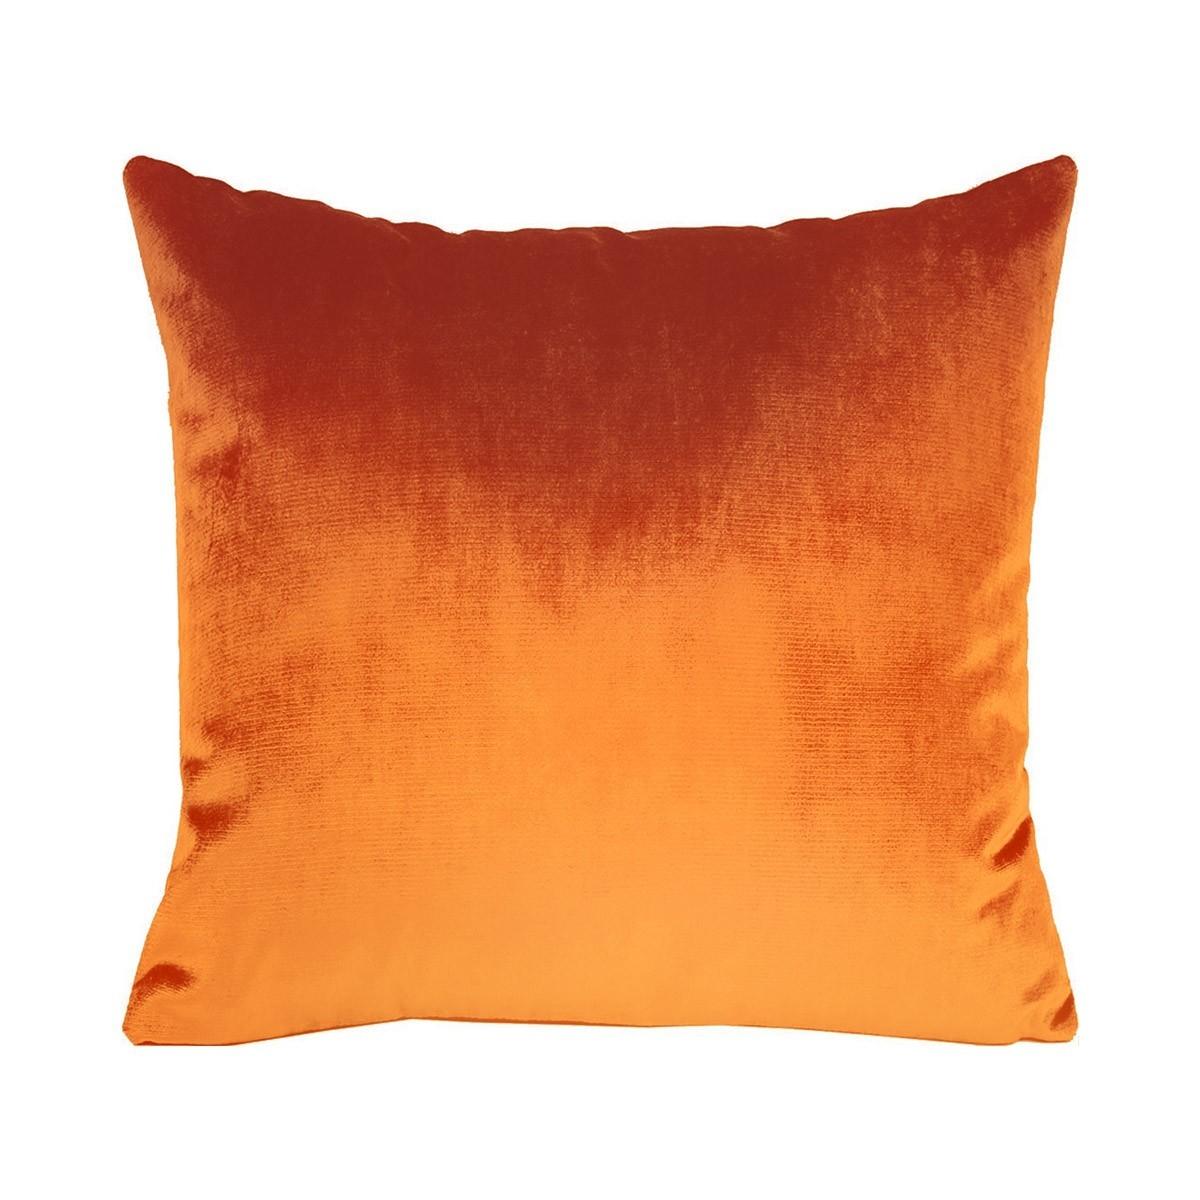 Iosis Kissen delorme iosis berlingot decorative pillow